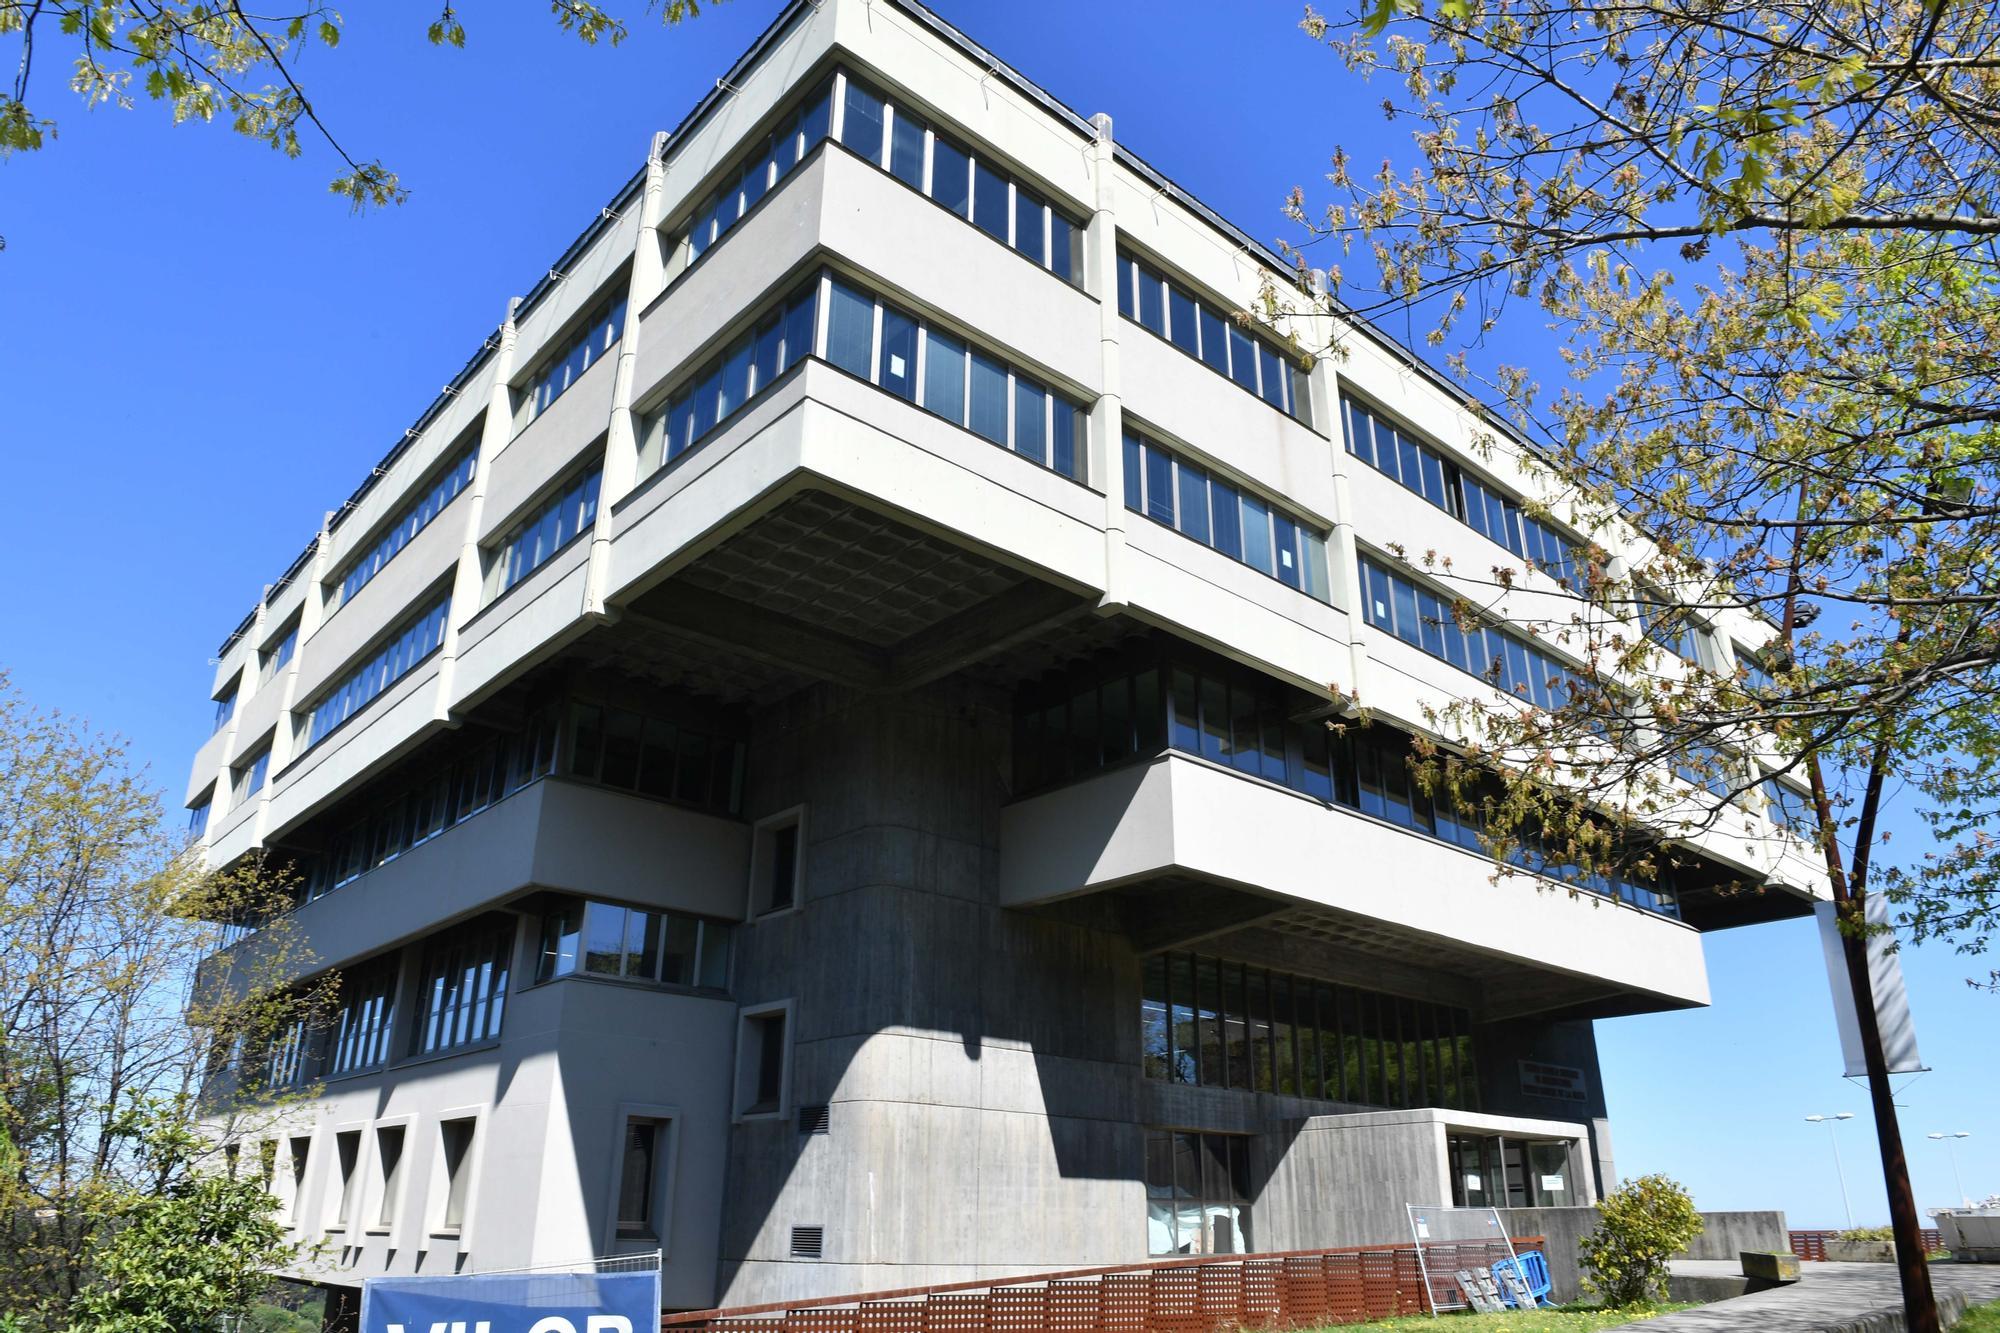 Visita a la Escuela Técnica Superior de Arquitectura